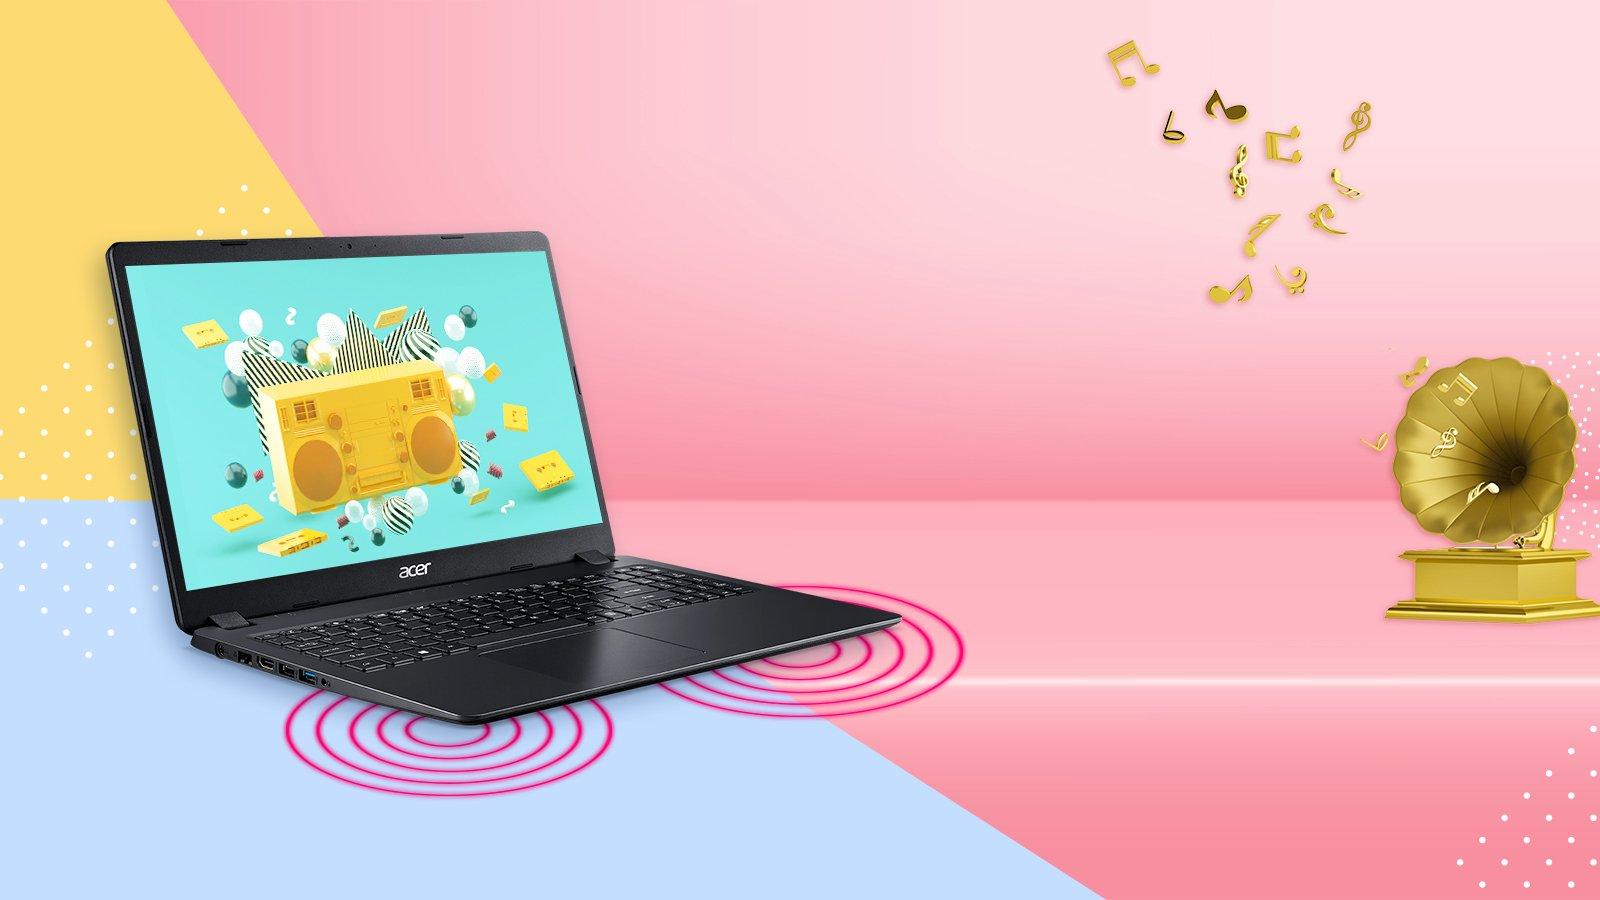 laptop-acer-aspire-3-a315-57g-31yd-5